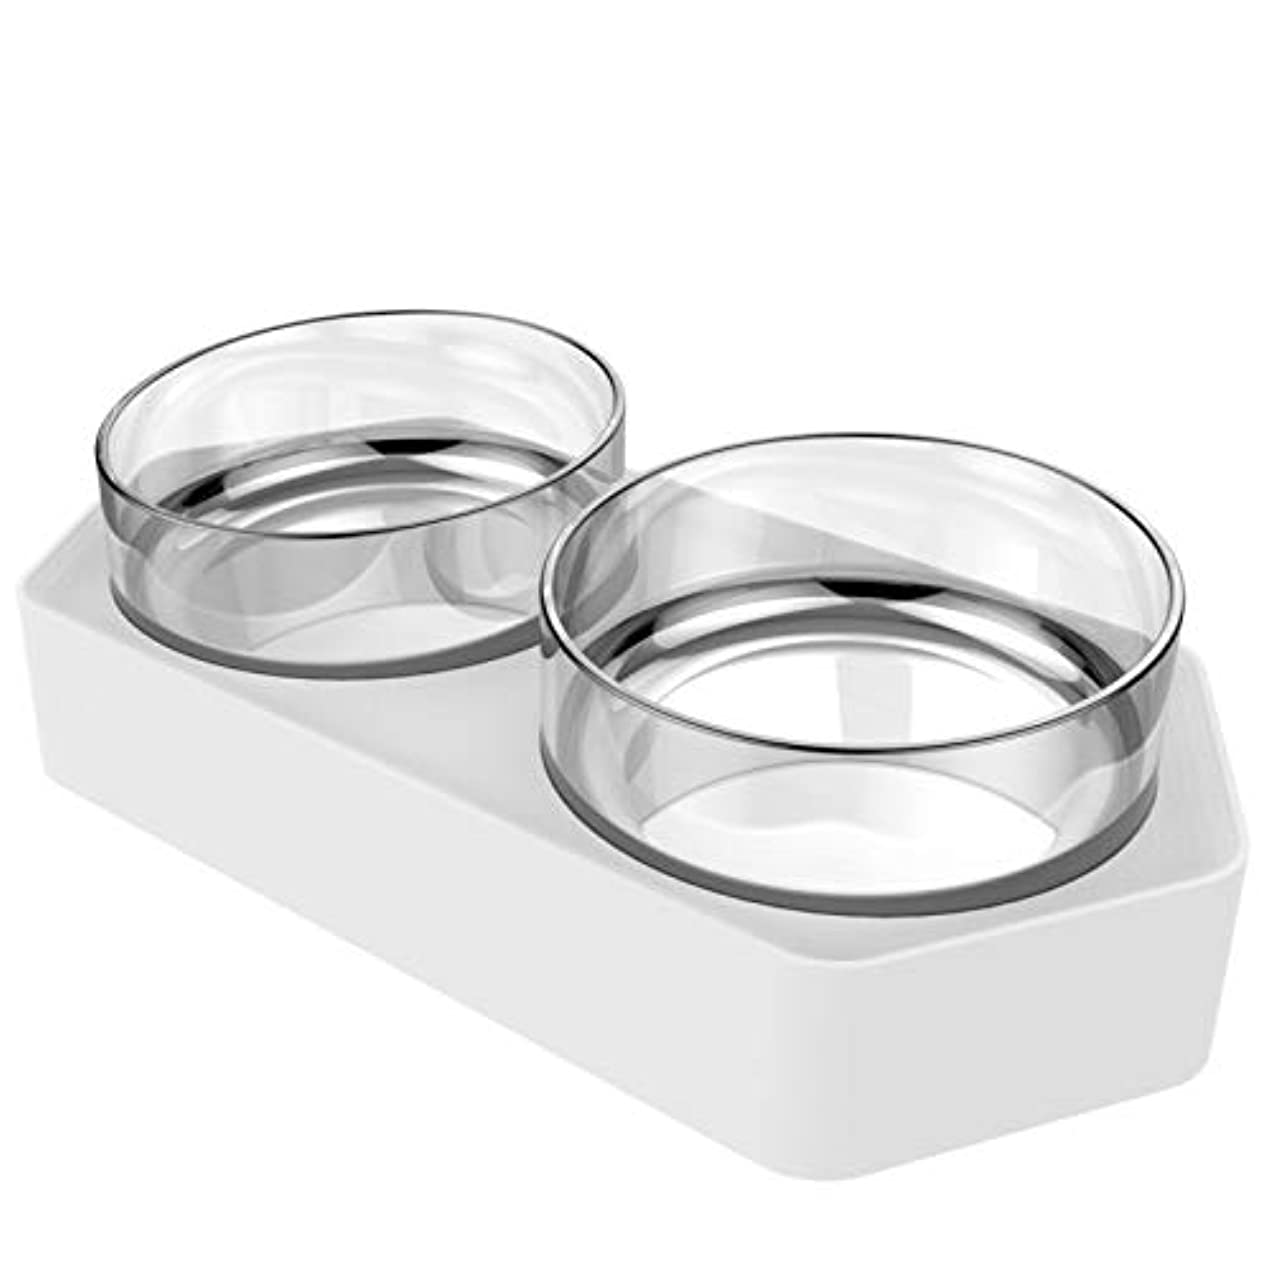 LIFE新しいプラスチック製ダブルノンスリップペットボウル子犬猫食品水フィーダーボウルペット給餌食器犬のボウルペット給餌猫ボウルペット食器